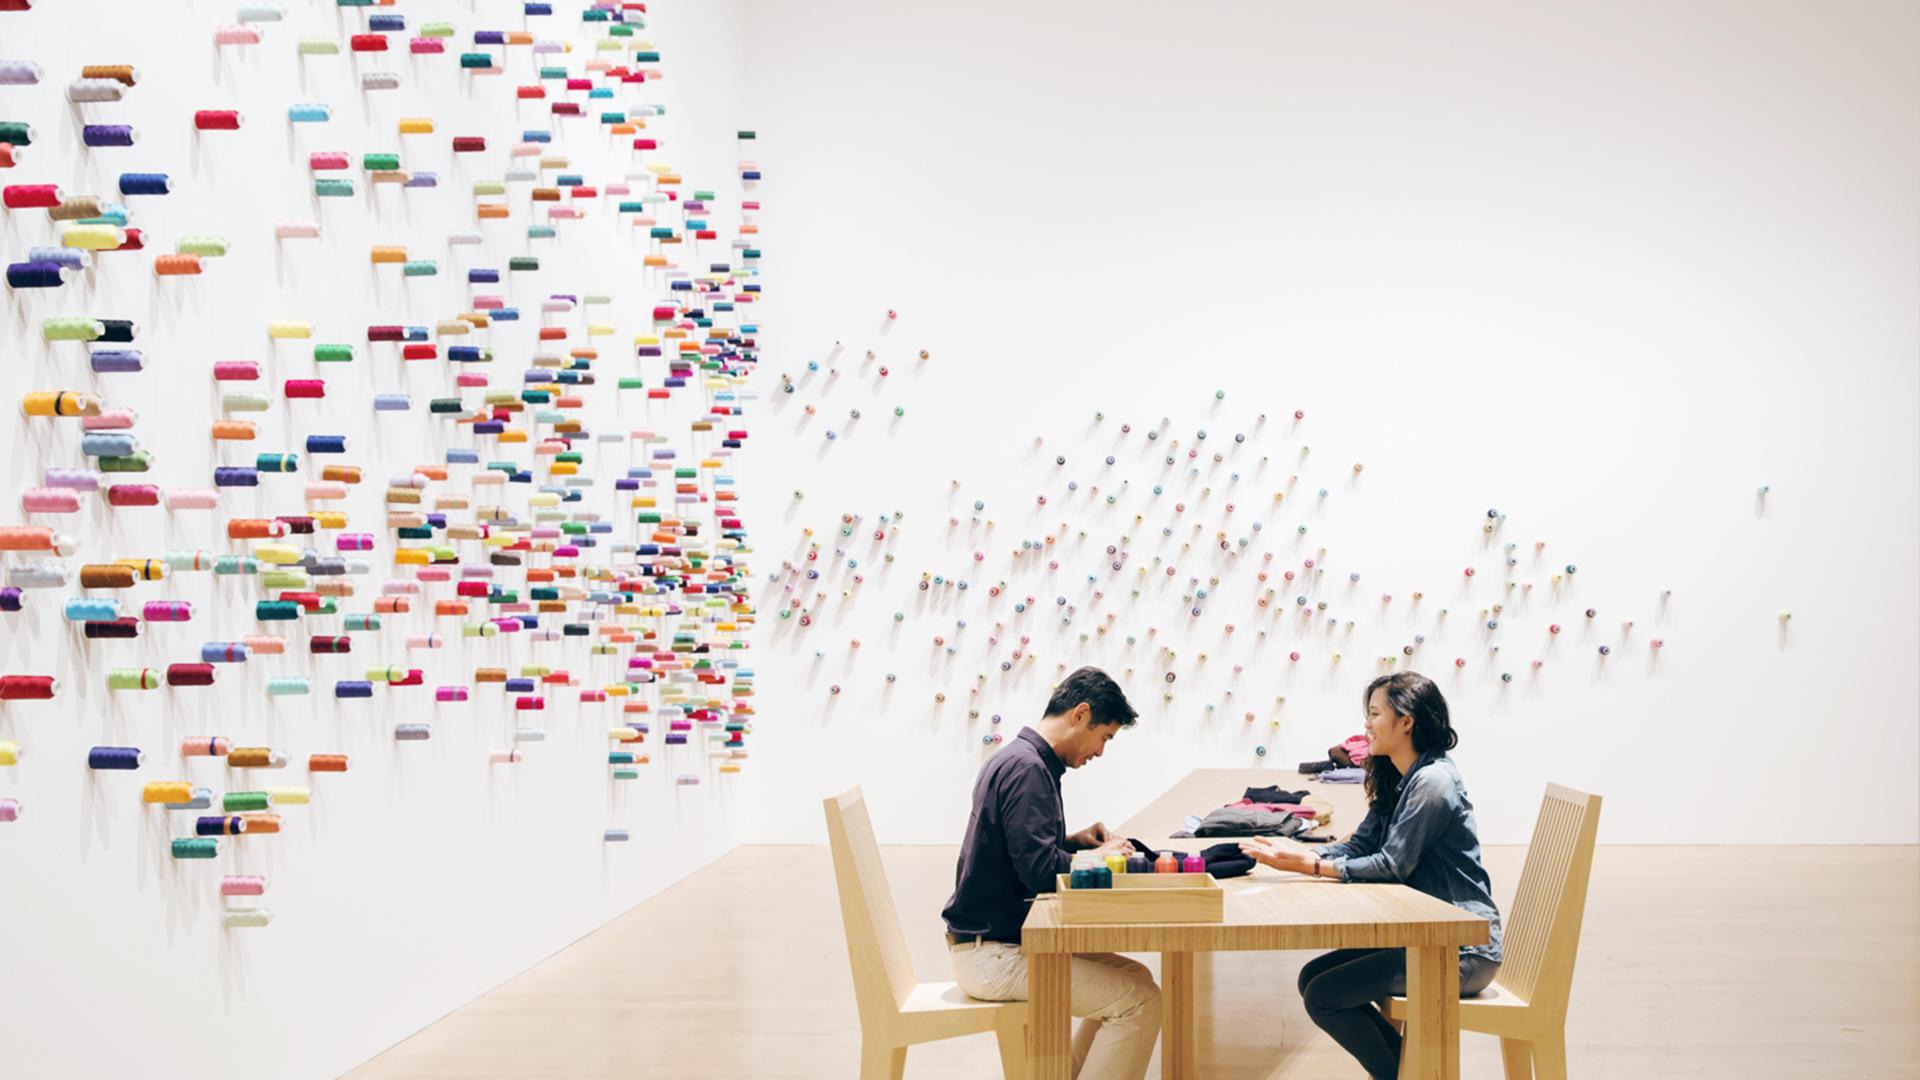 Lee Mingwei (Chinese), The Mending Project, 2009-2018. Photo by Yoshitsugu Fuminari.